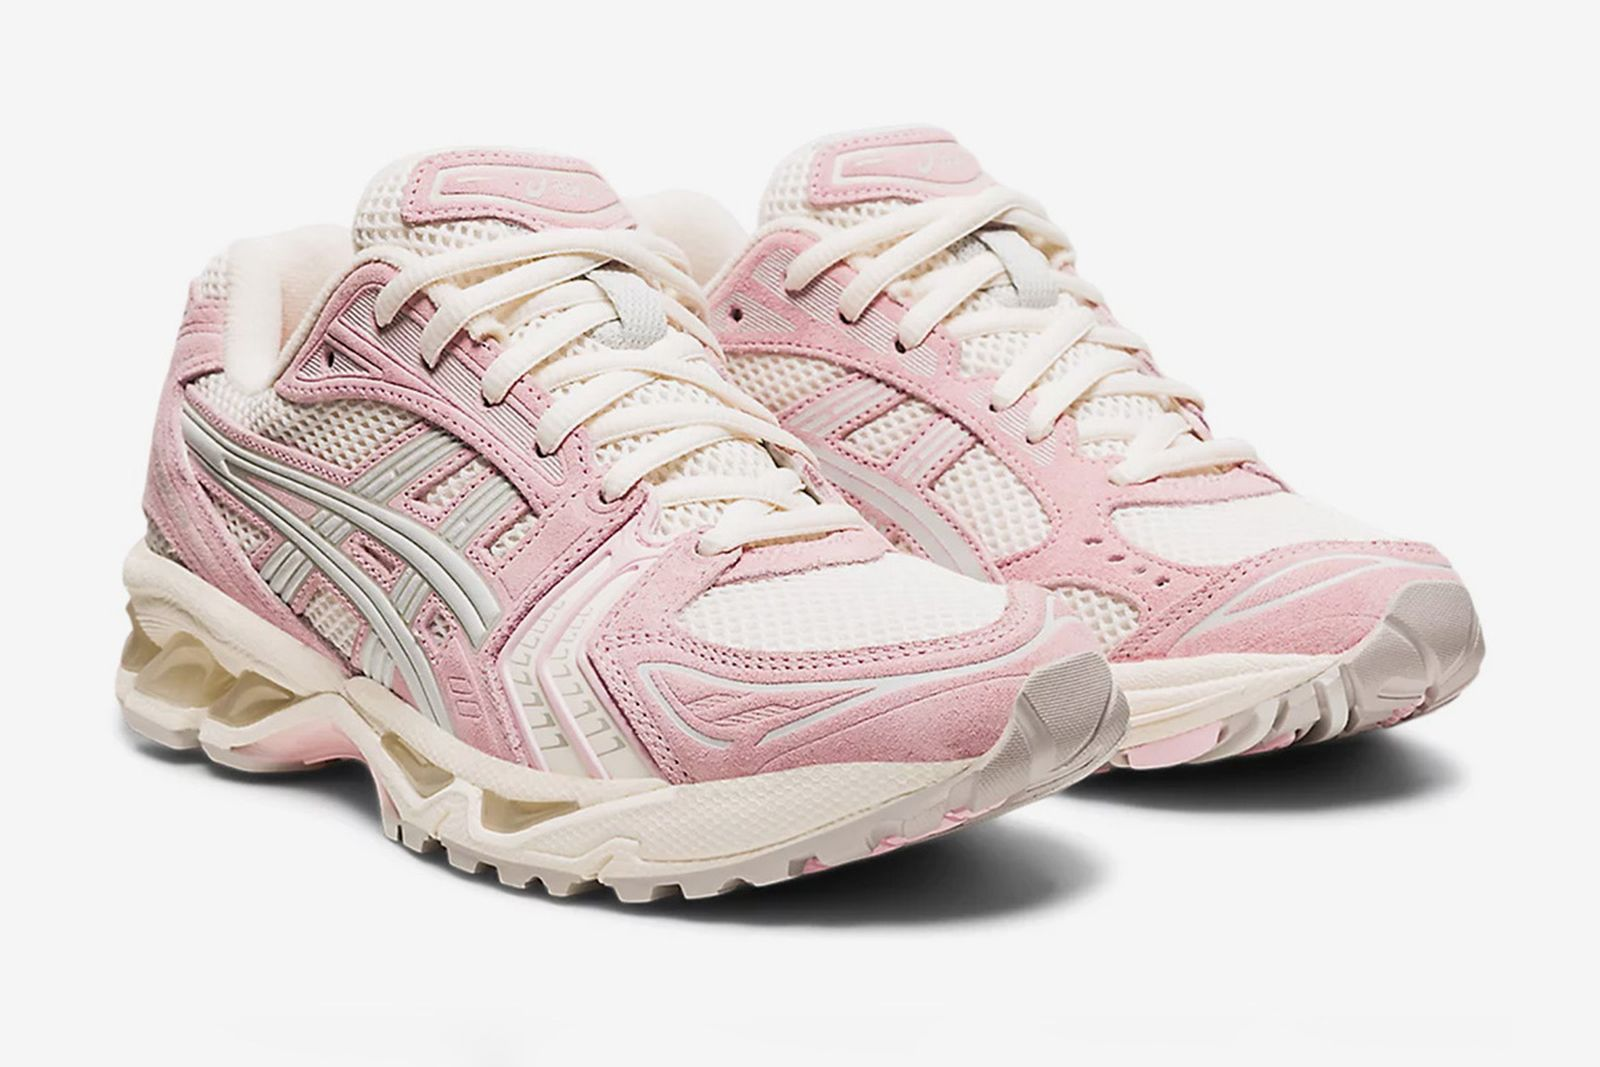 asics-gel-kayano-14-pink-salt-release-date-price-03